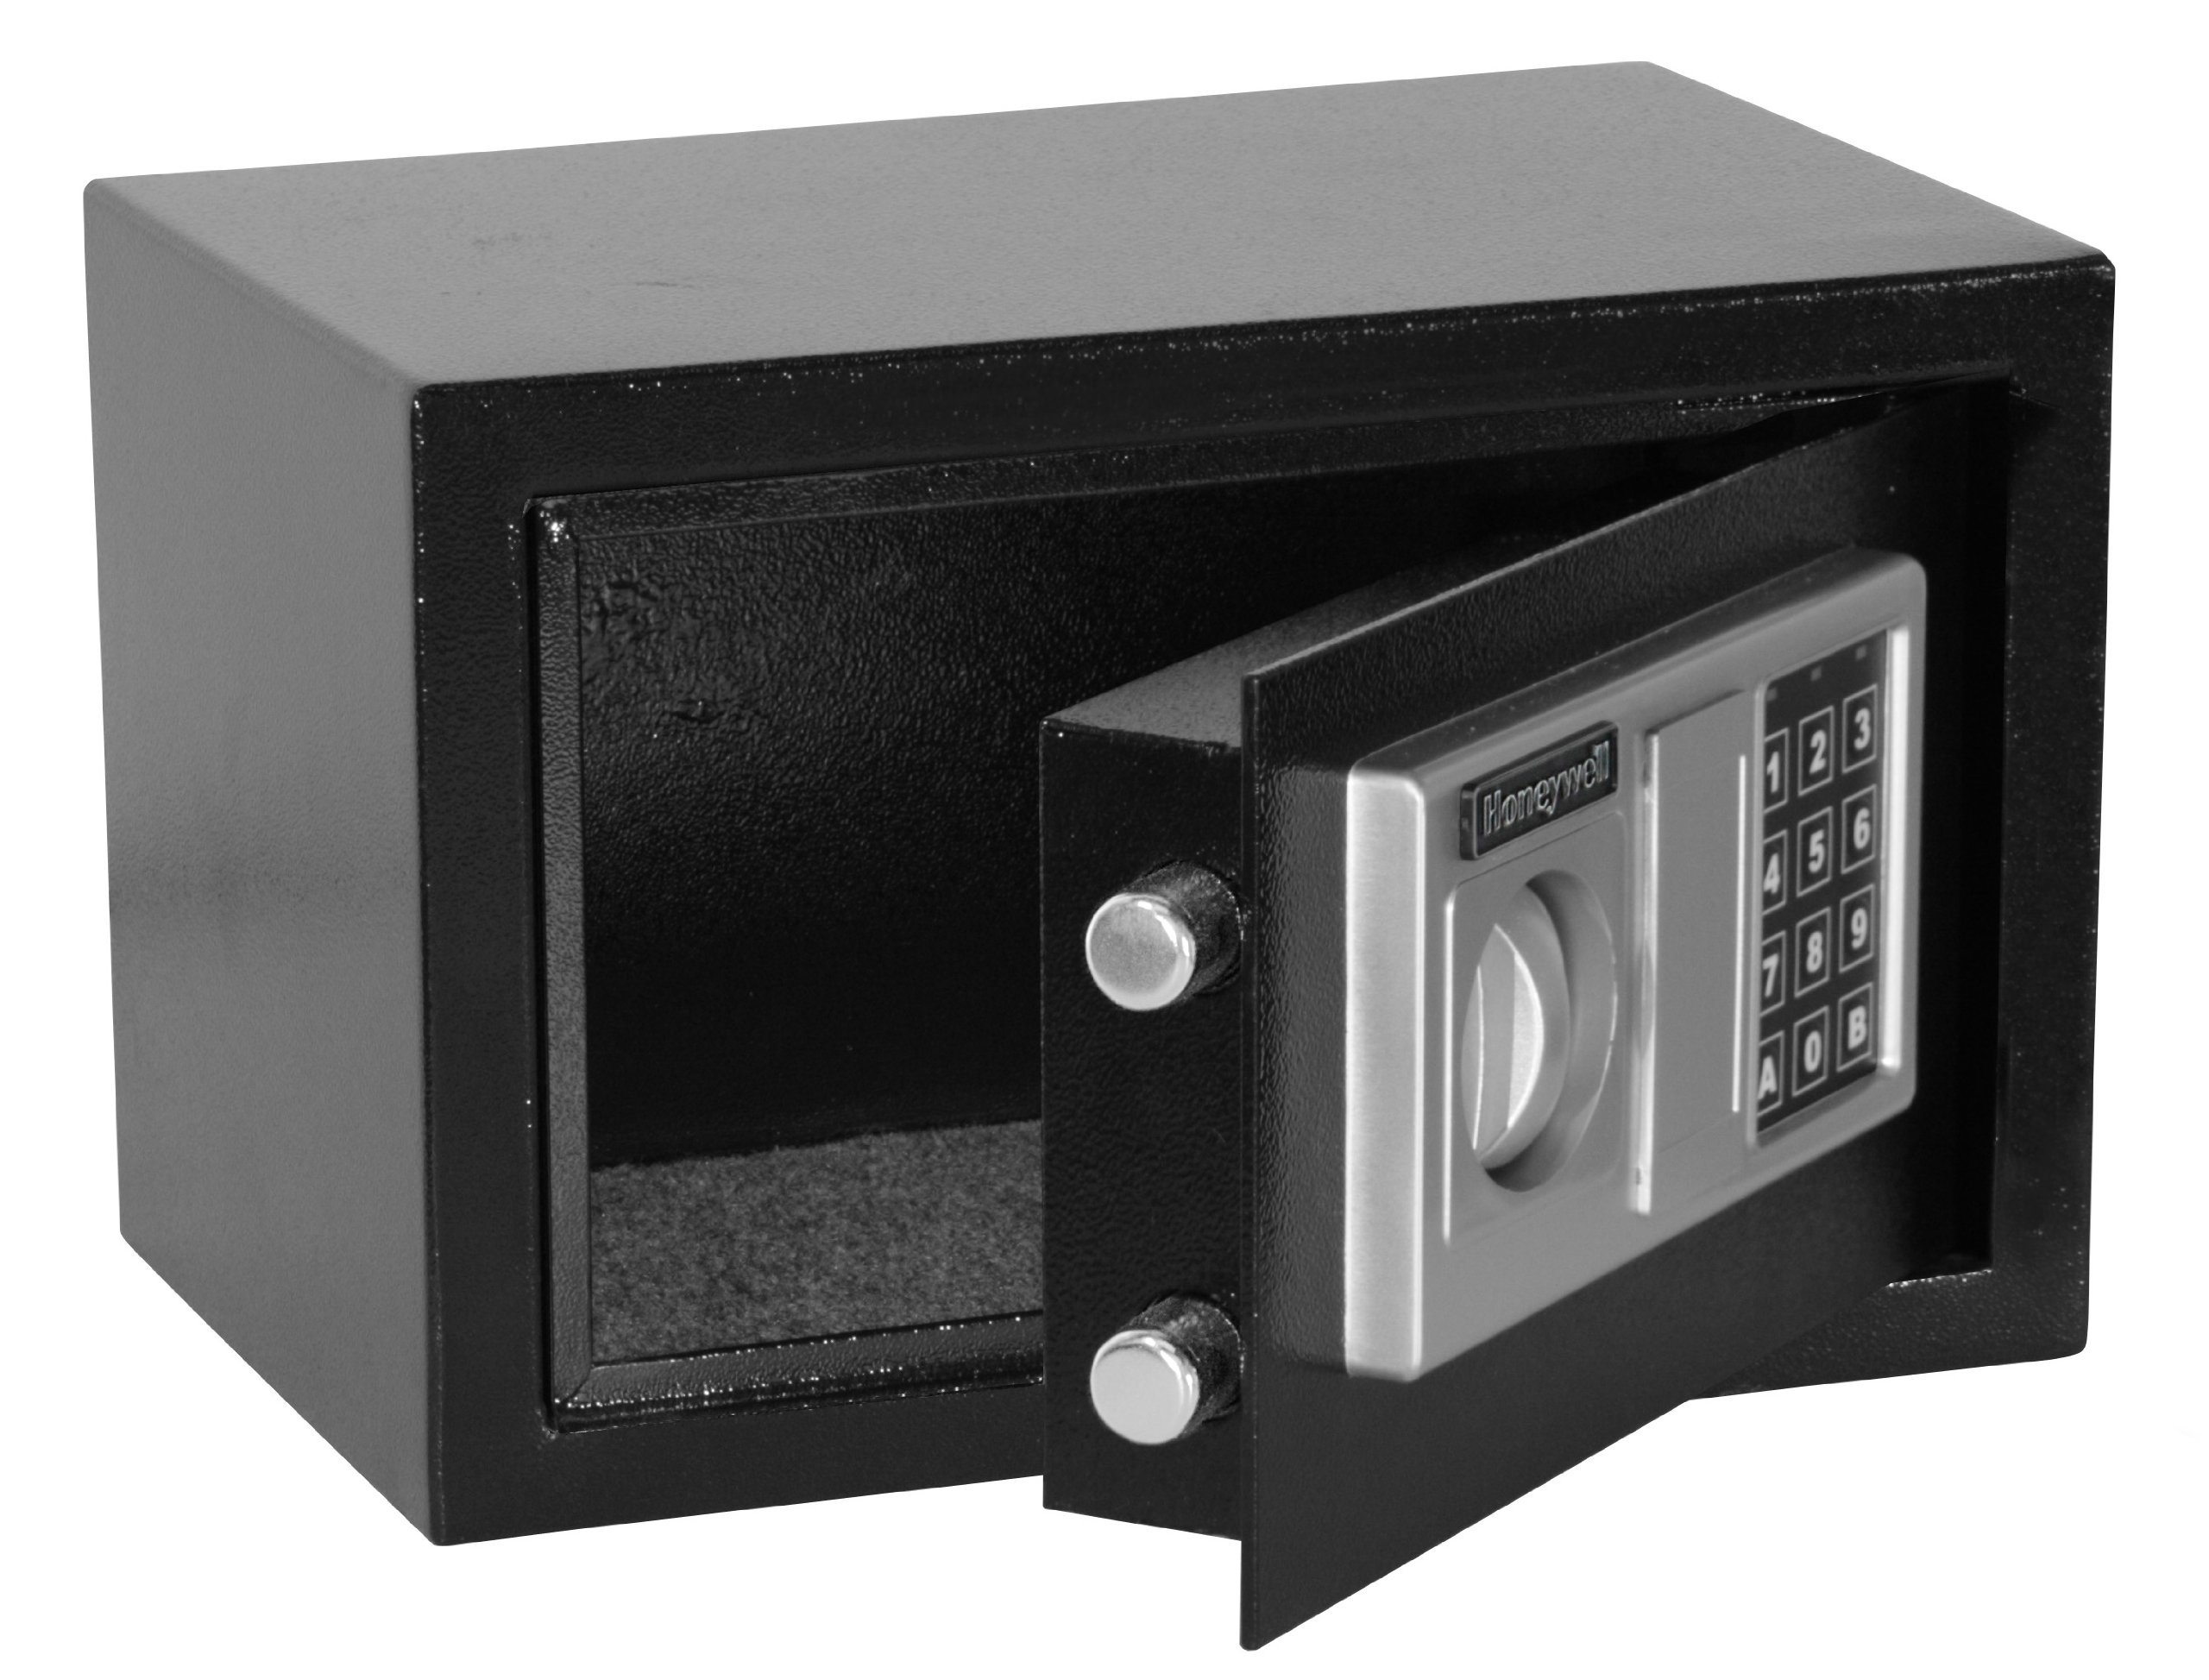 Honeywell Safes & Door Locks 5301DOJ Steel Security Safe with Digital Lock.28 Cubic ft, Black by Honeywell Safes & Door Locks